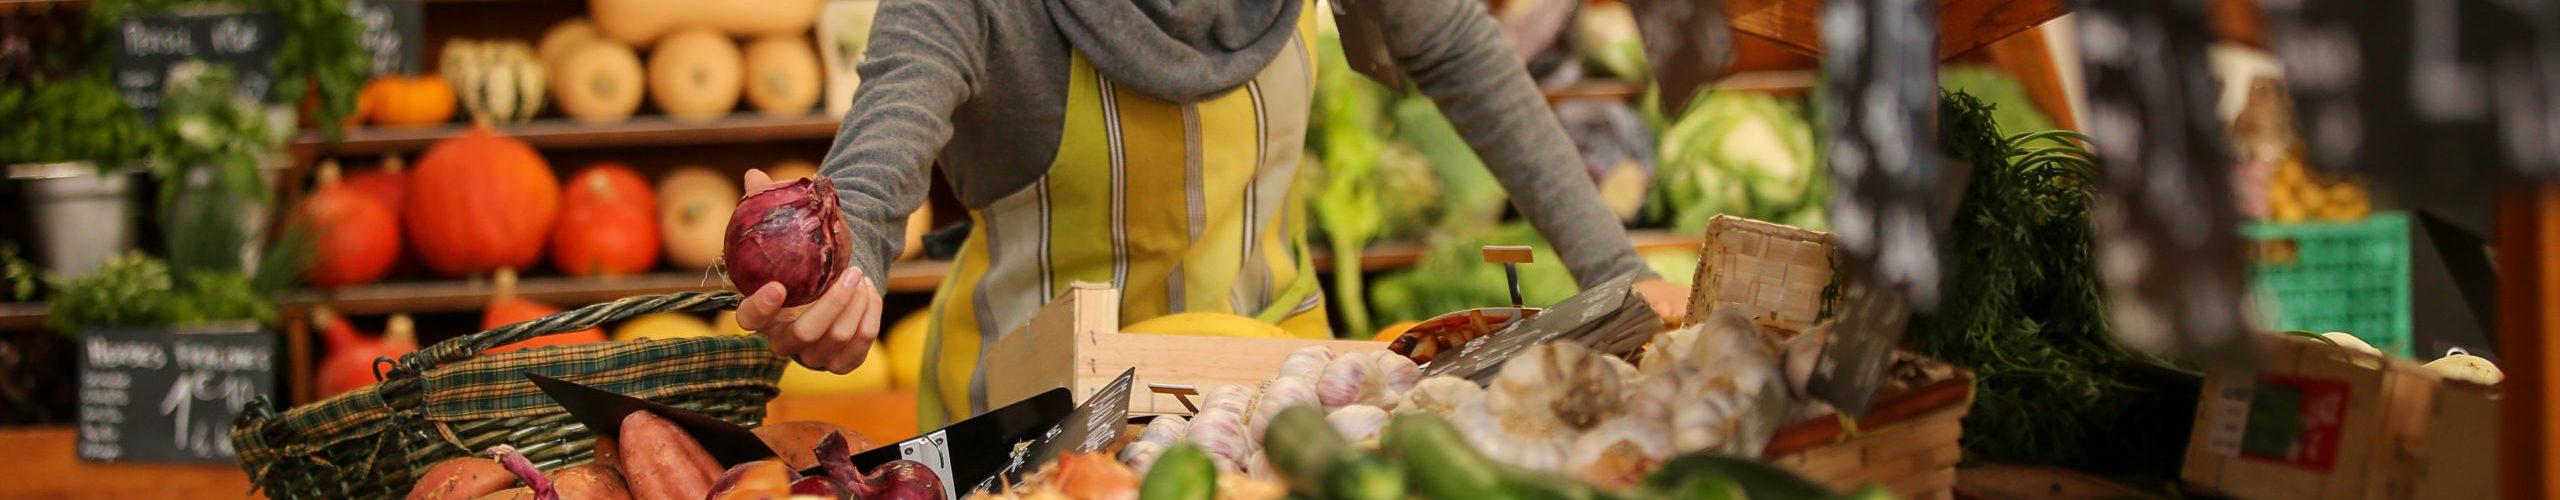 vegetables seller in retail store